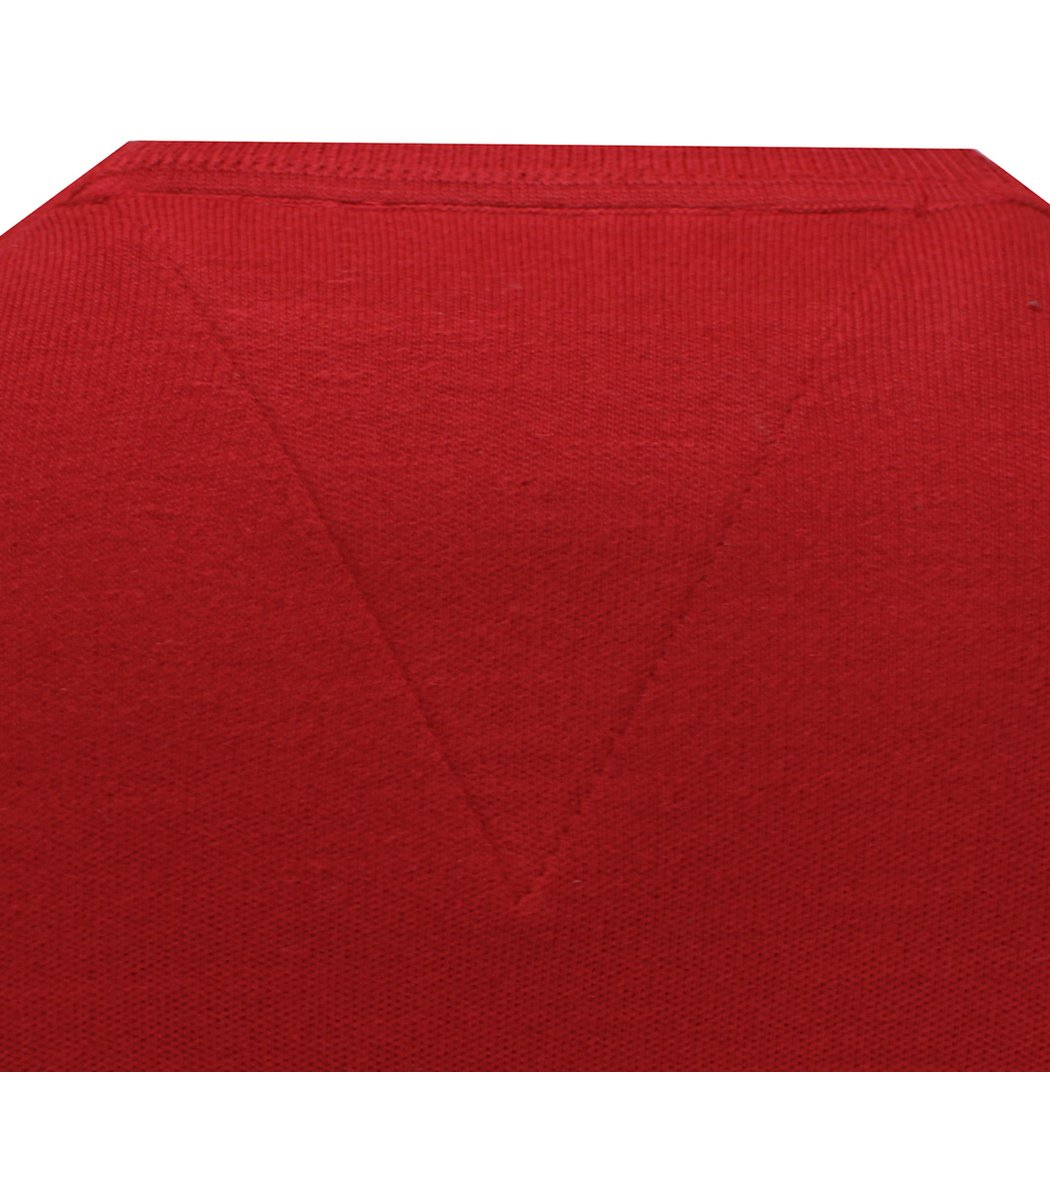 Красный джемпер POLO Ralph Lauren JRN